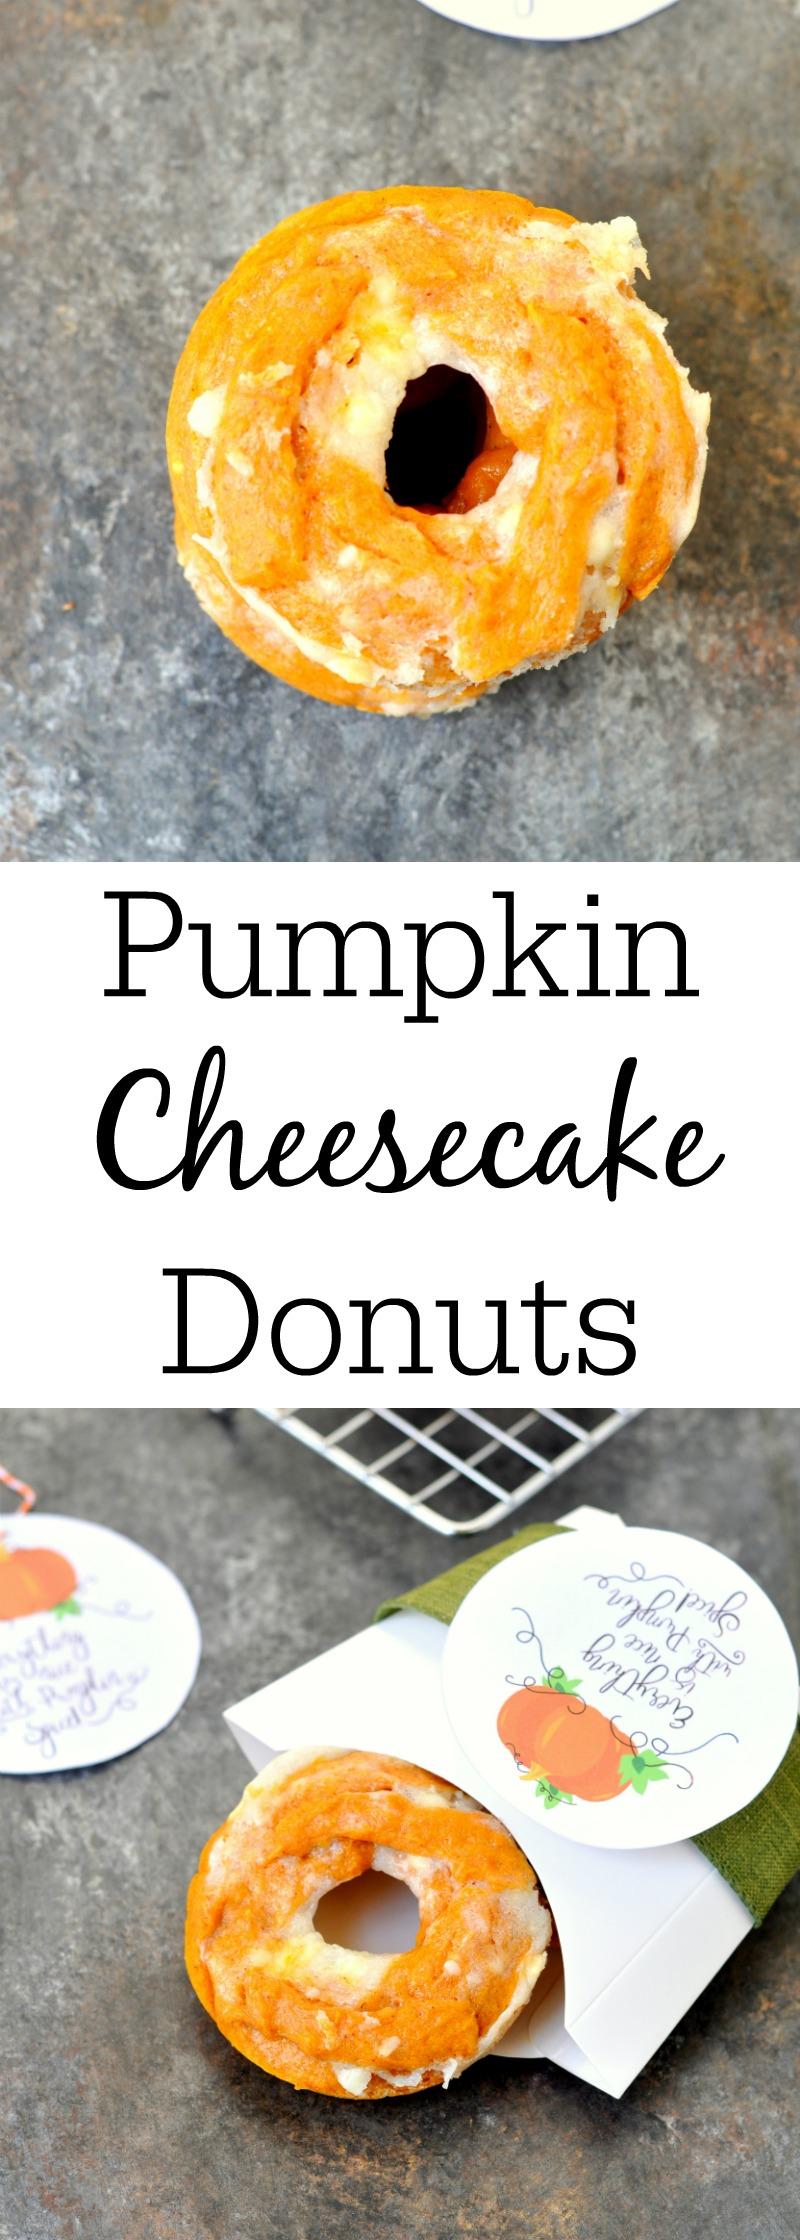 Pumpkin Spice Cheesecake Donuts